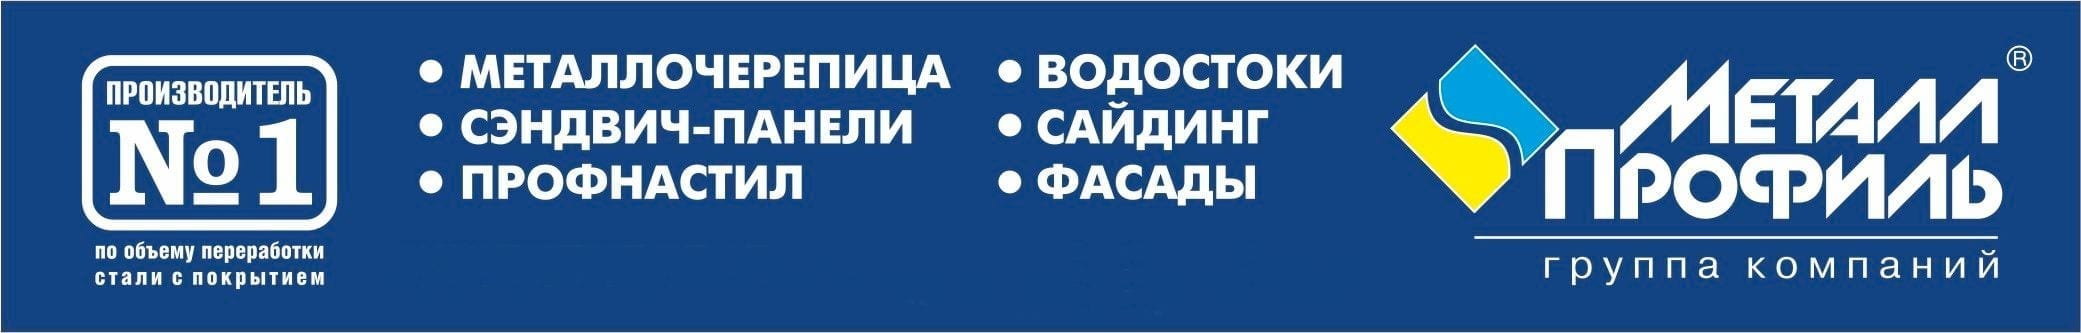 metall-profil-logo